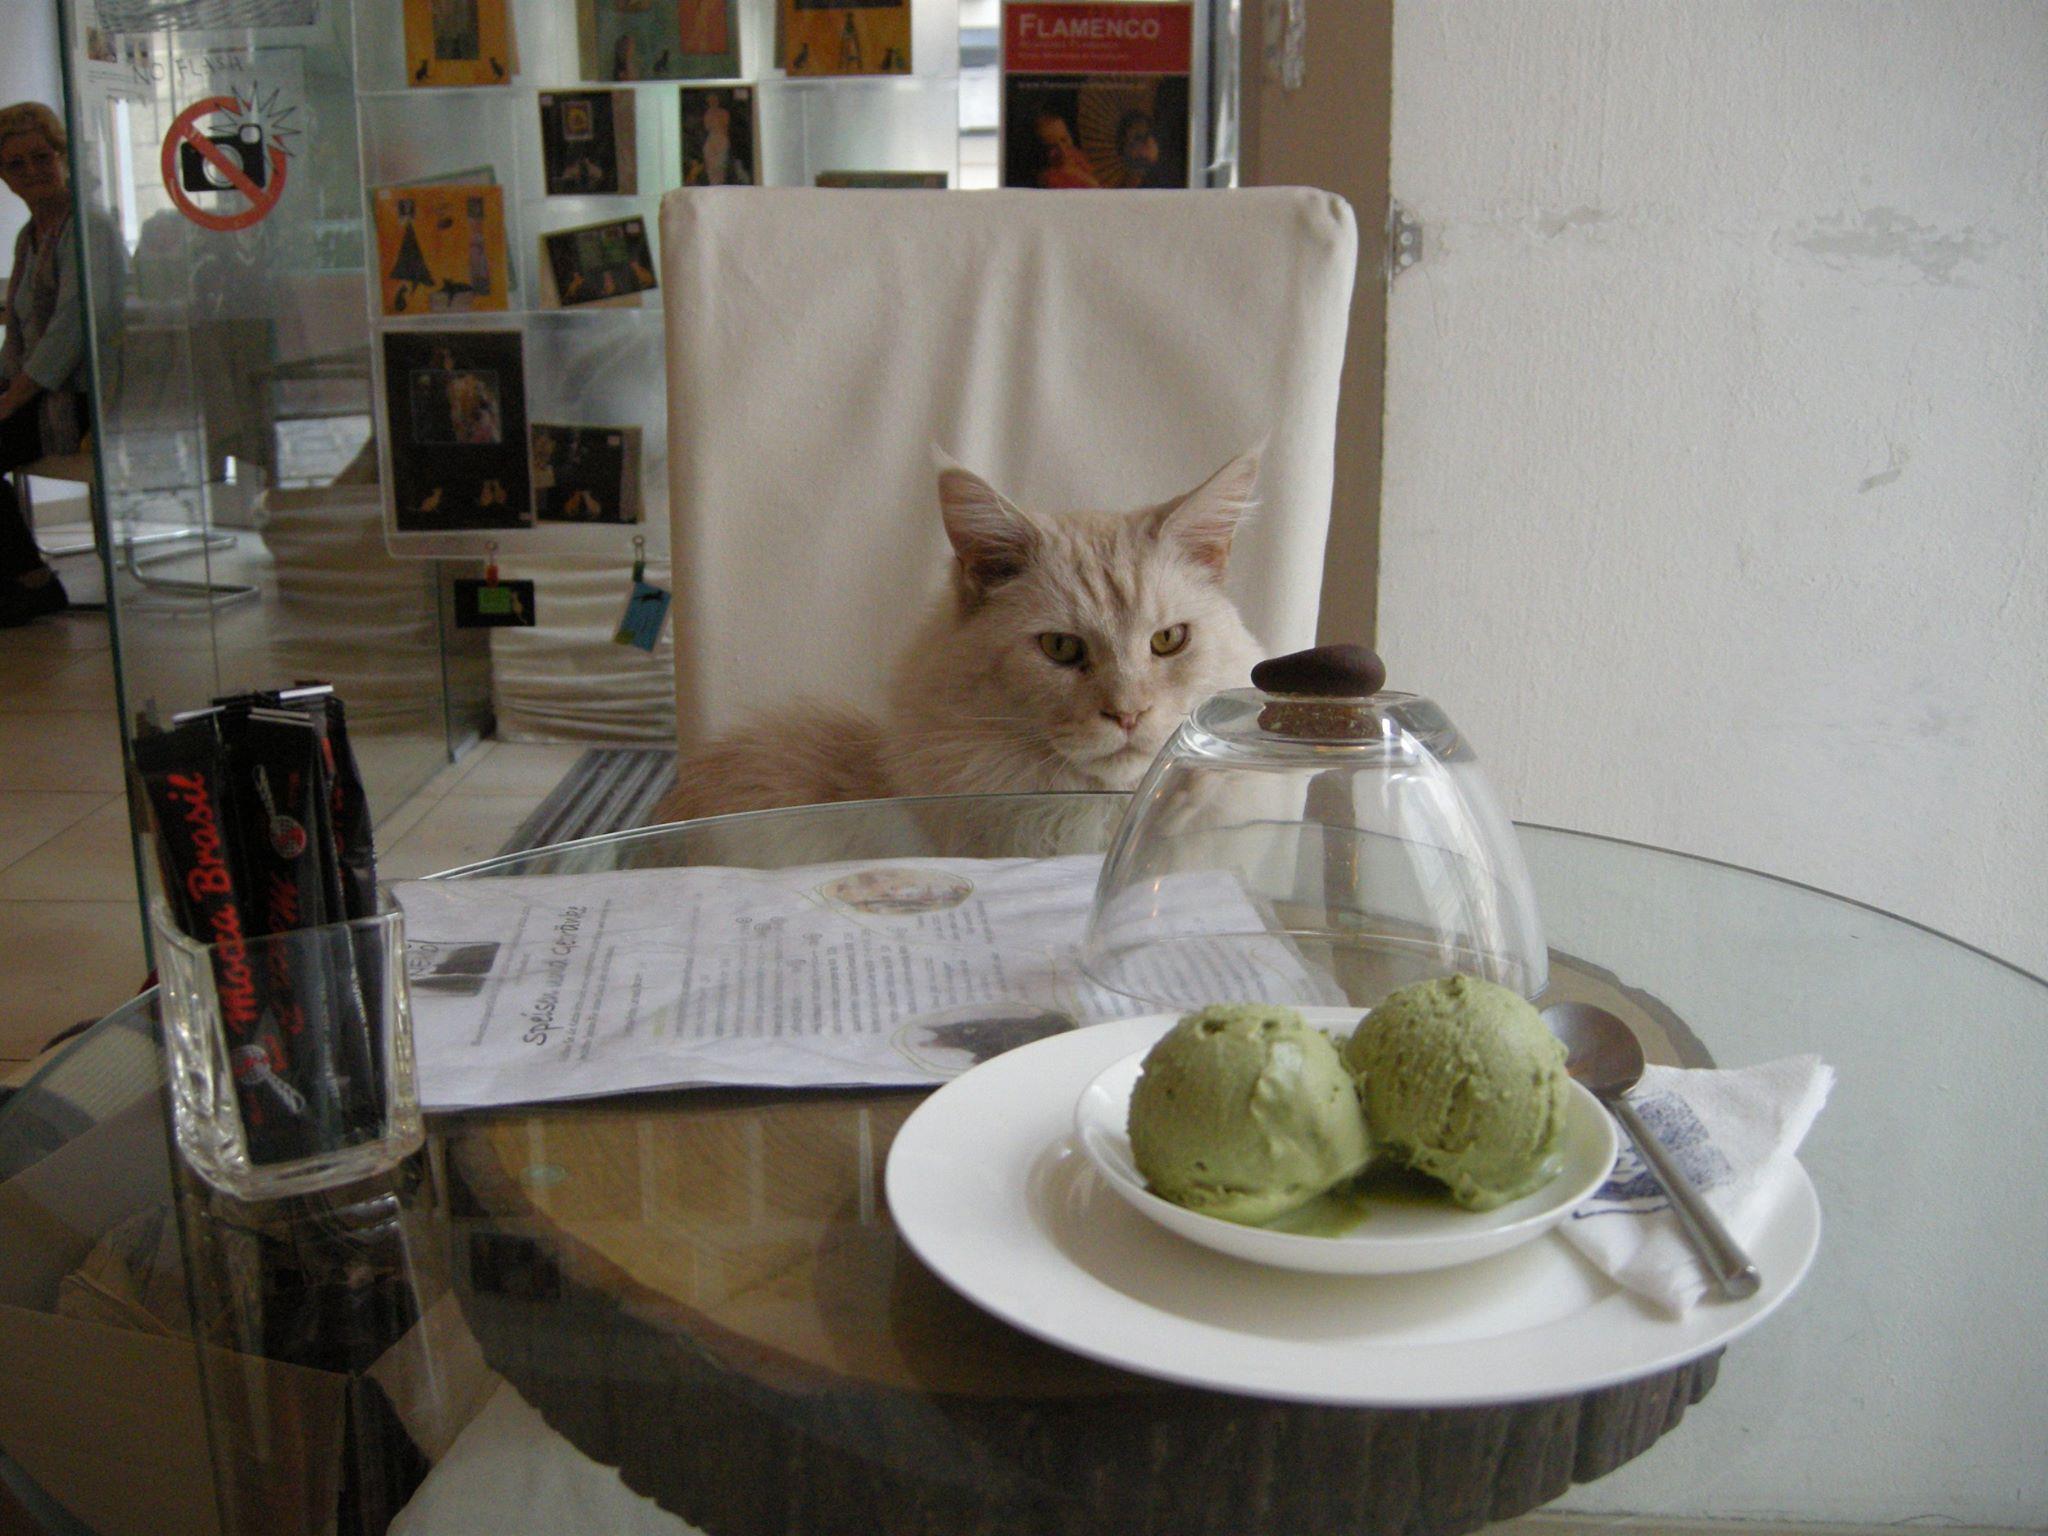 Neko in Vienna, Austria cat cafes in Europe